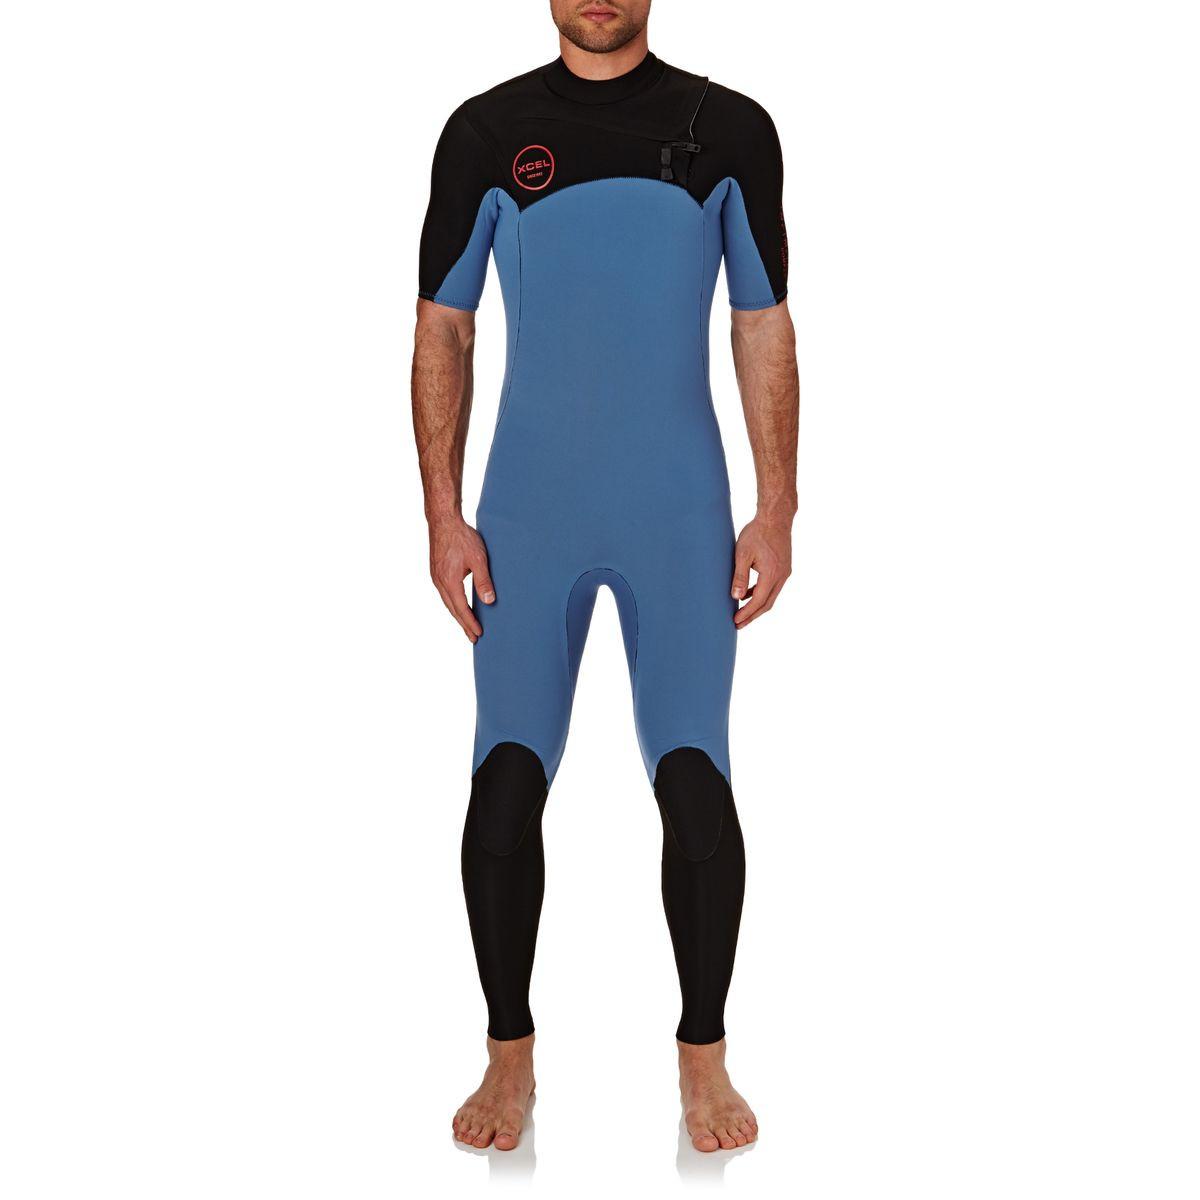 Xcel Infiniti Comp 2mm 2017 Short Sleeve Chest Zip Wetsuit - Faience Blue / Black